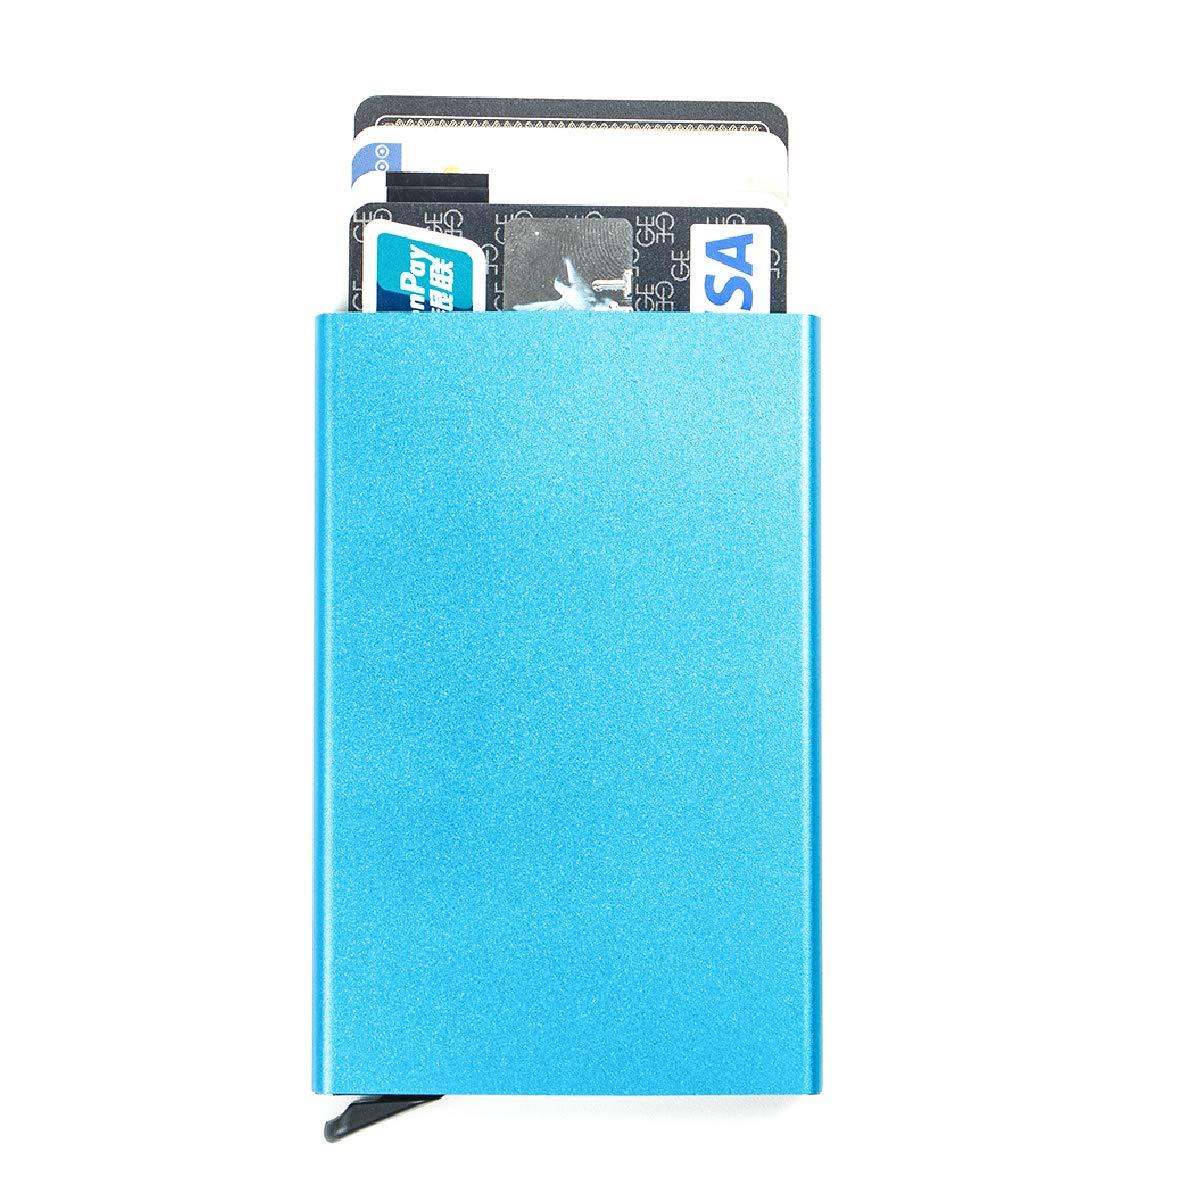 Green Azarxis RFID Blocking Credit Card Holder Automatic Pop-up Aluminum Slim Metal Wallet